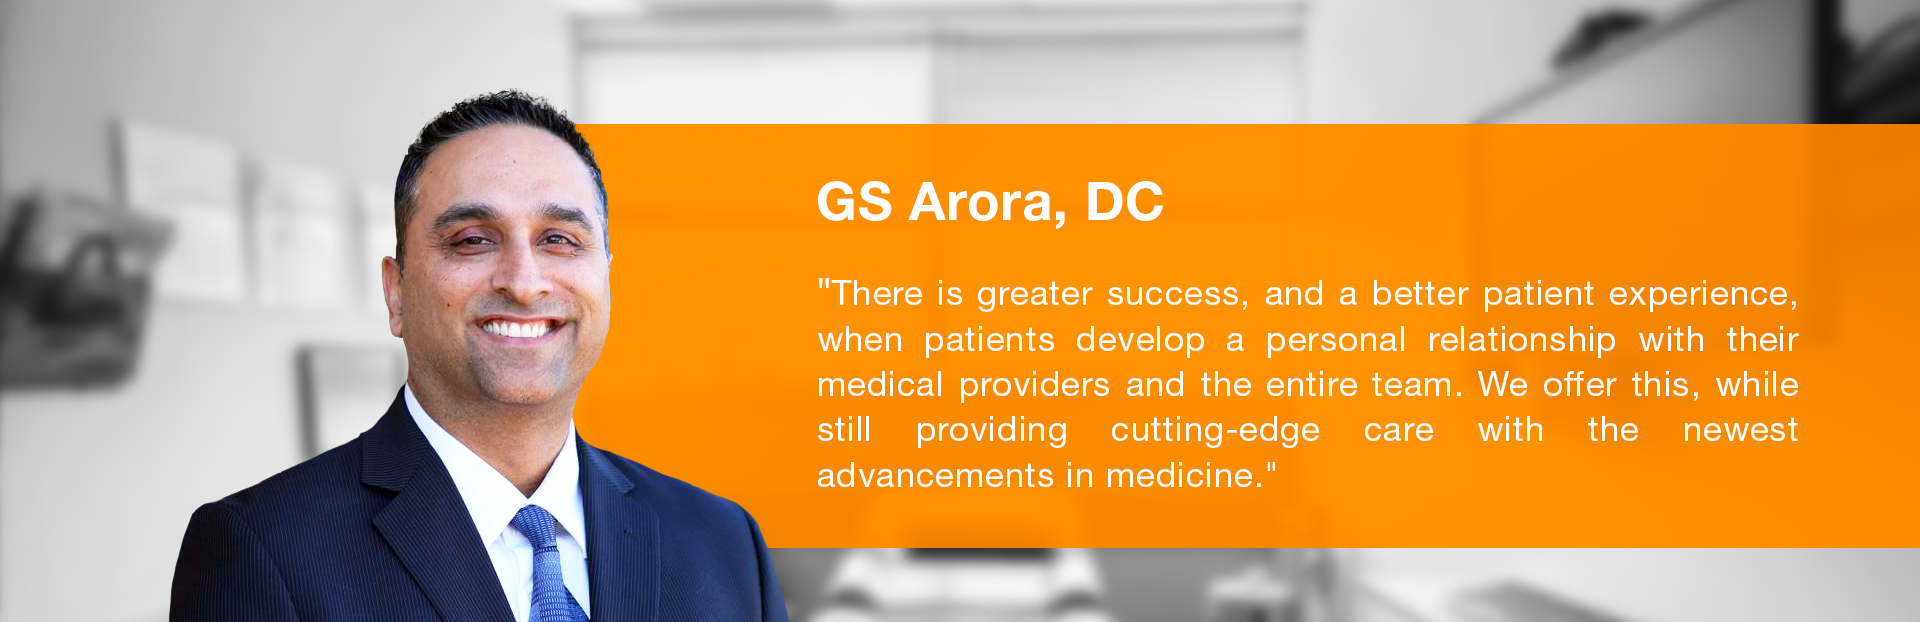 Dr. GS Arora